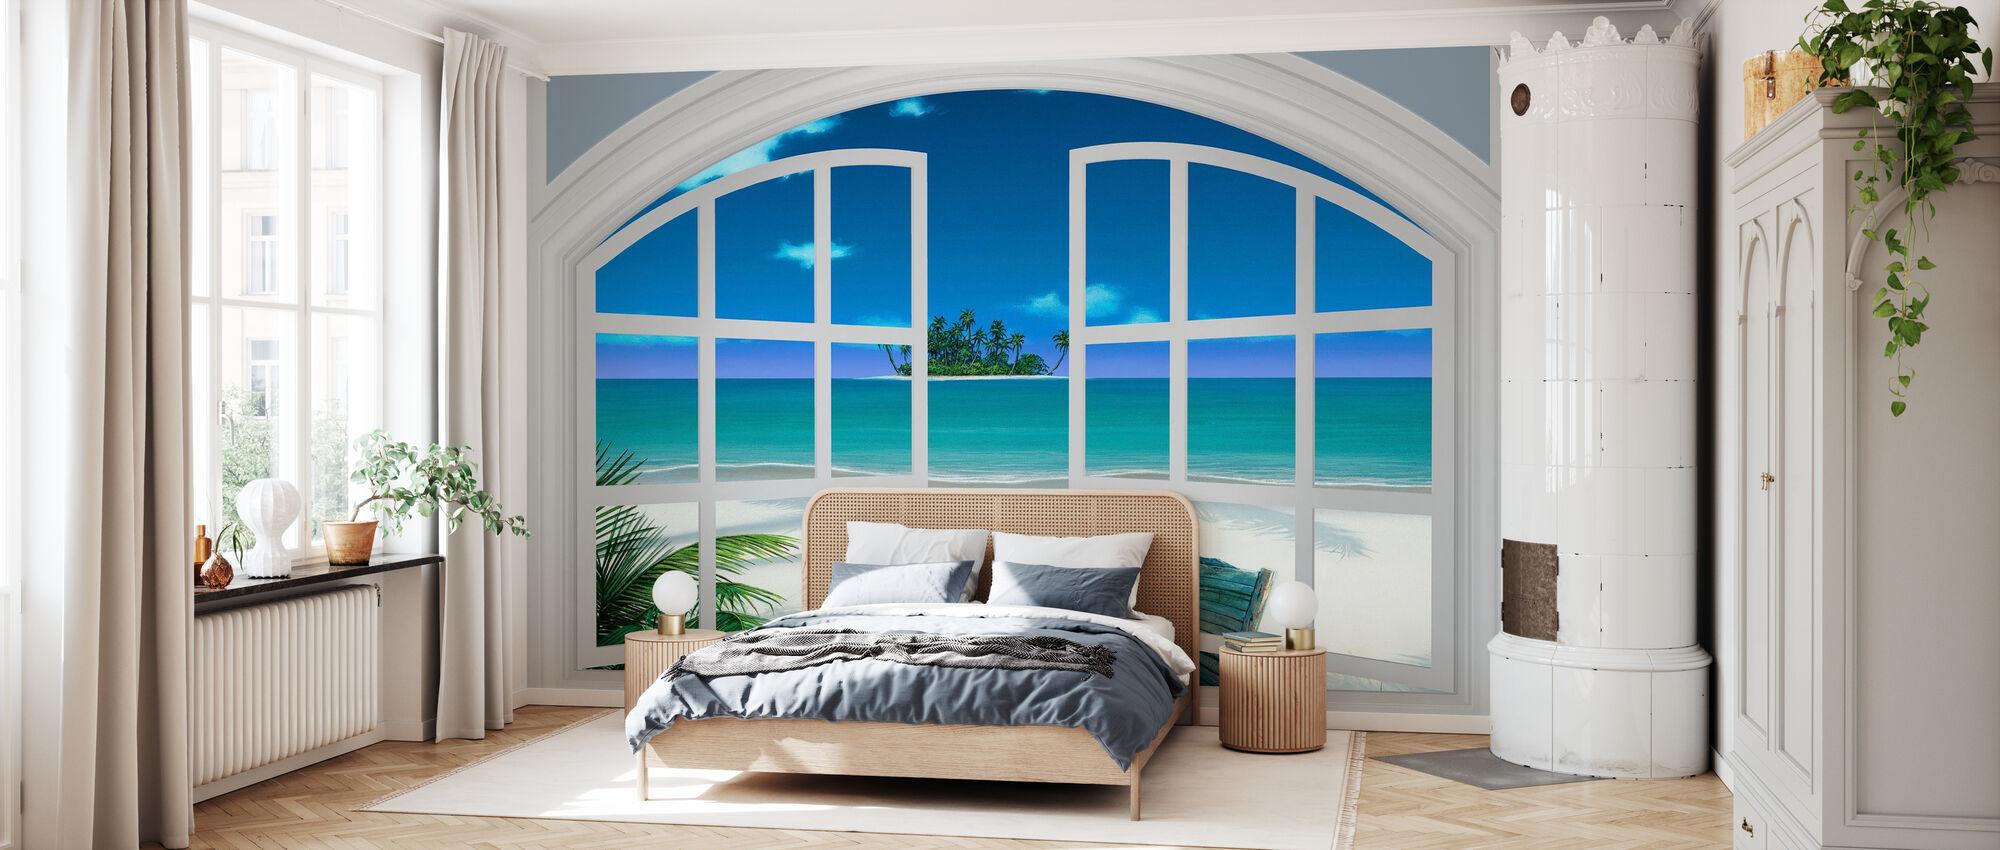 Beach View Through Window - Wallpaper - Bedroom